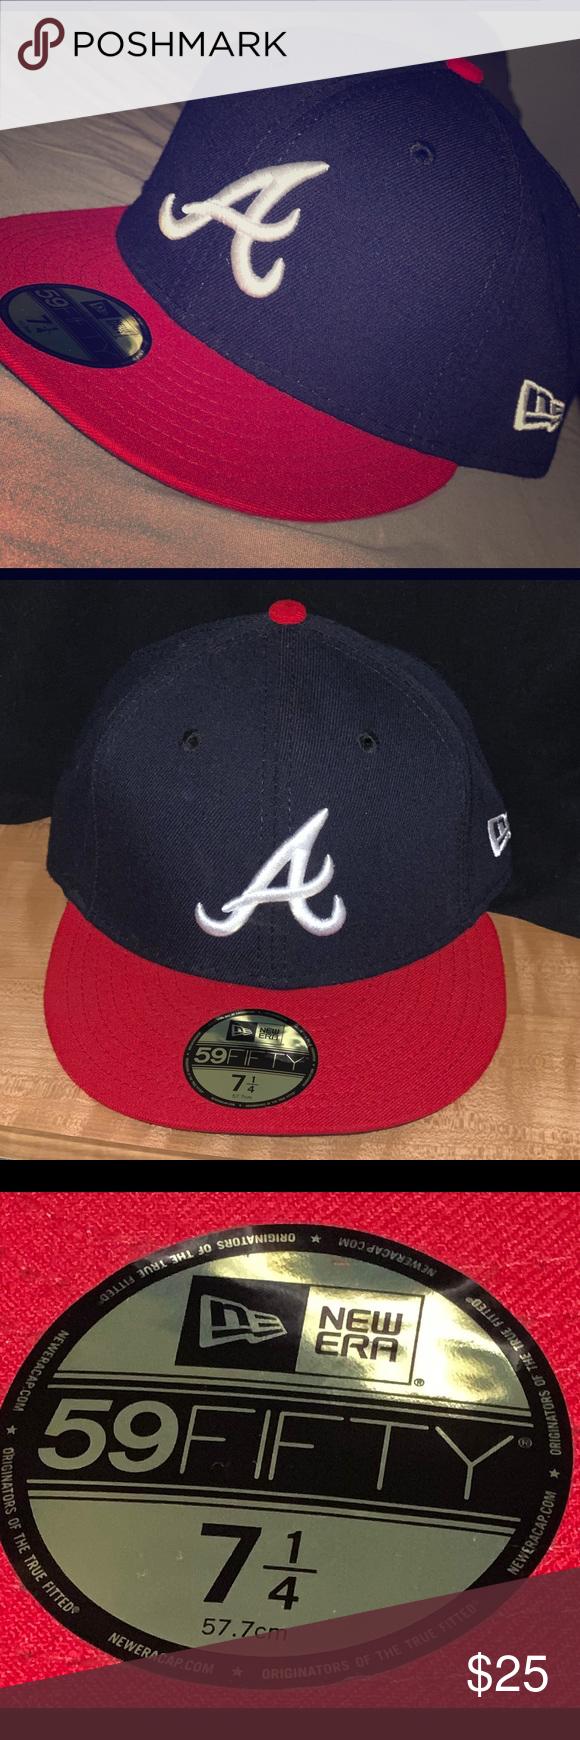 New Era Authentic Atlanta Braves Baseball Cap Brand New Visor Sticker Still Attached Smoke Free Household New Atlanta Braves Baseball New Era Atlanta Braves